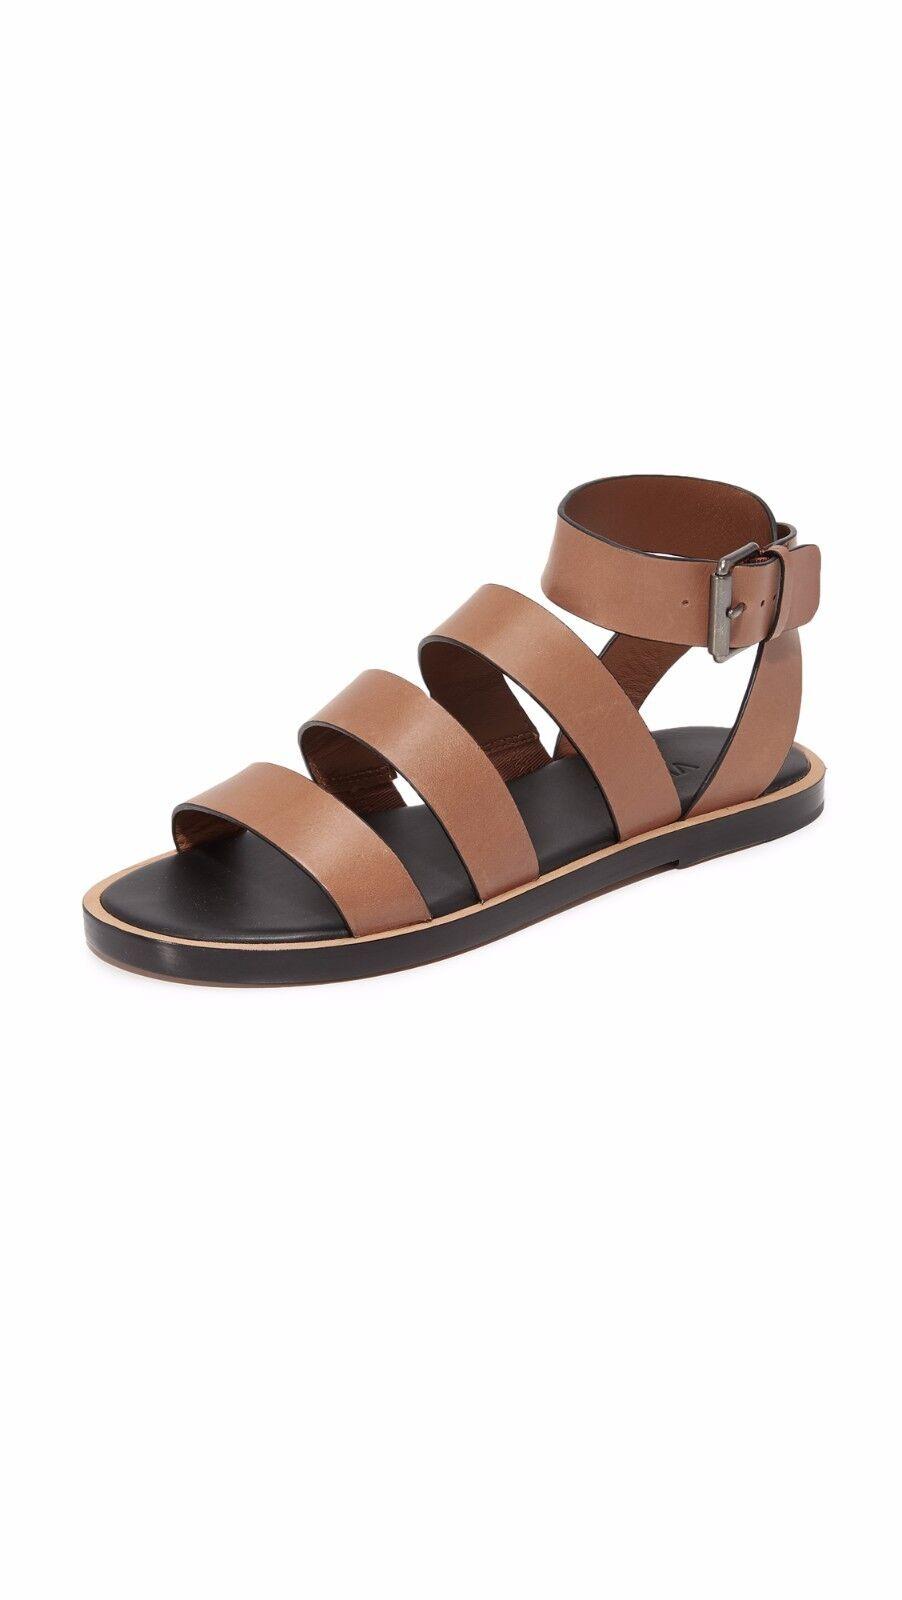 NIB Vince Macey Leather Flat Sandal Cedar (Camel Brown) Size 7, 9  275